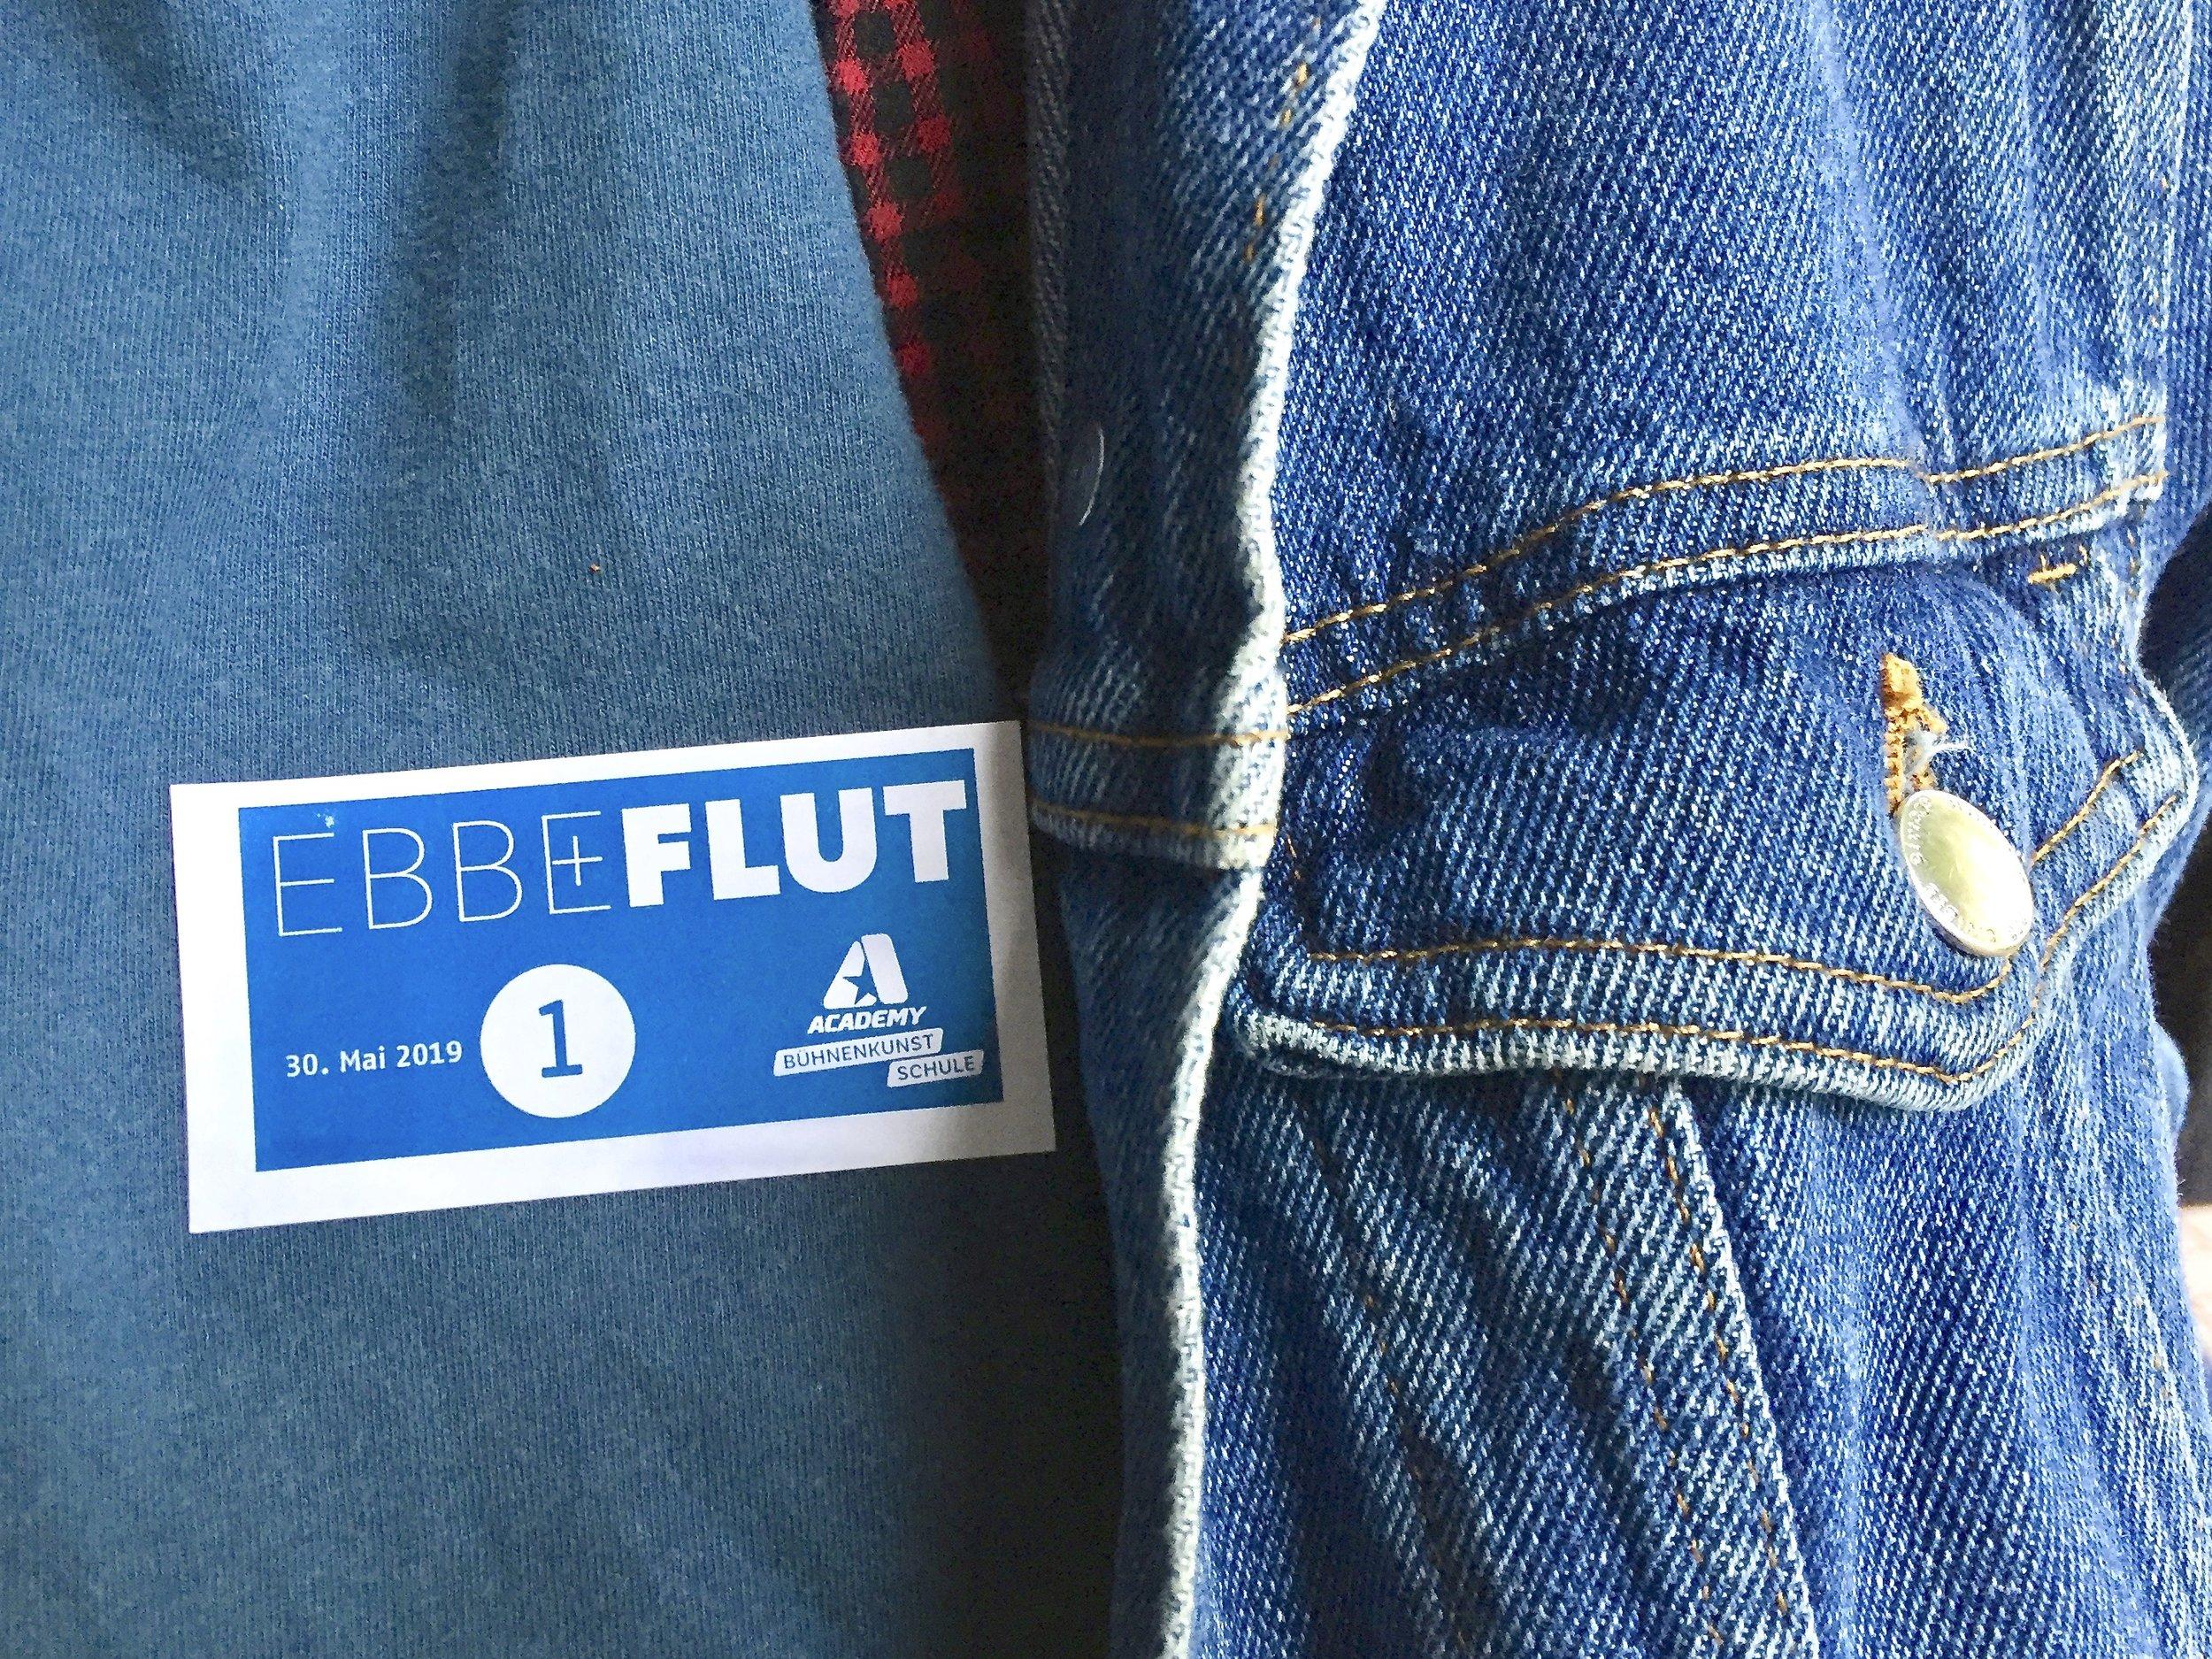 Eintrittskarte EBBE + FLUT